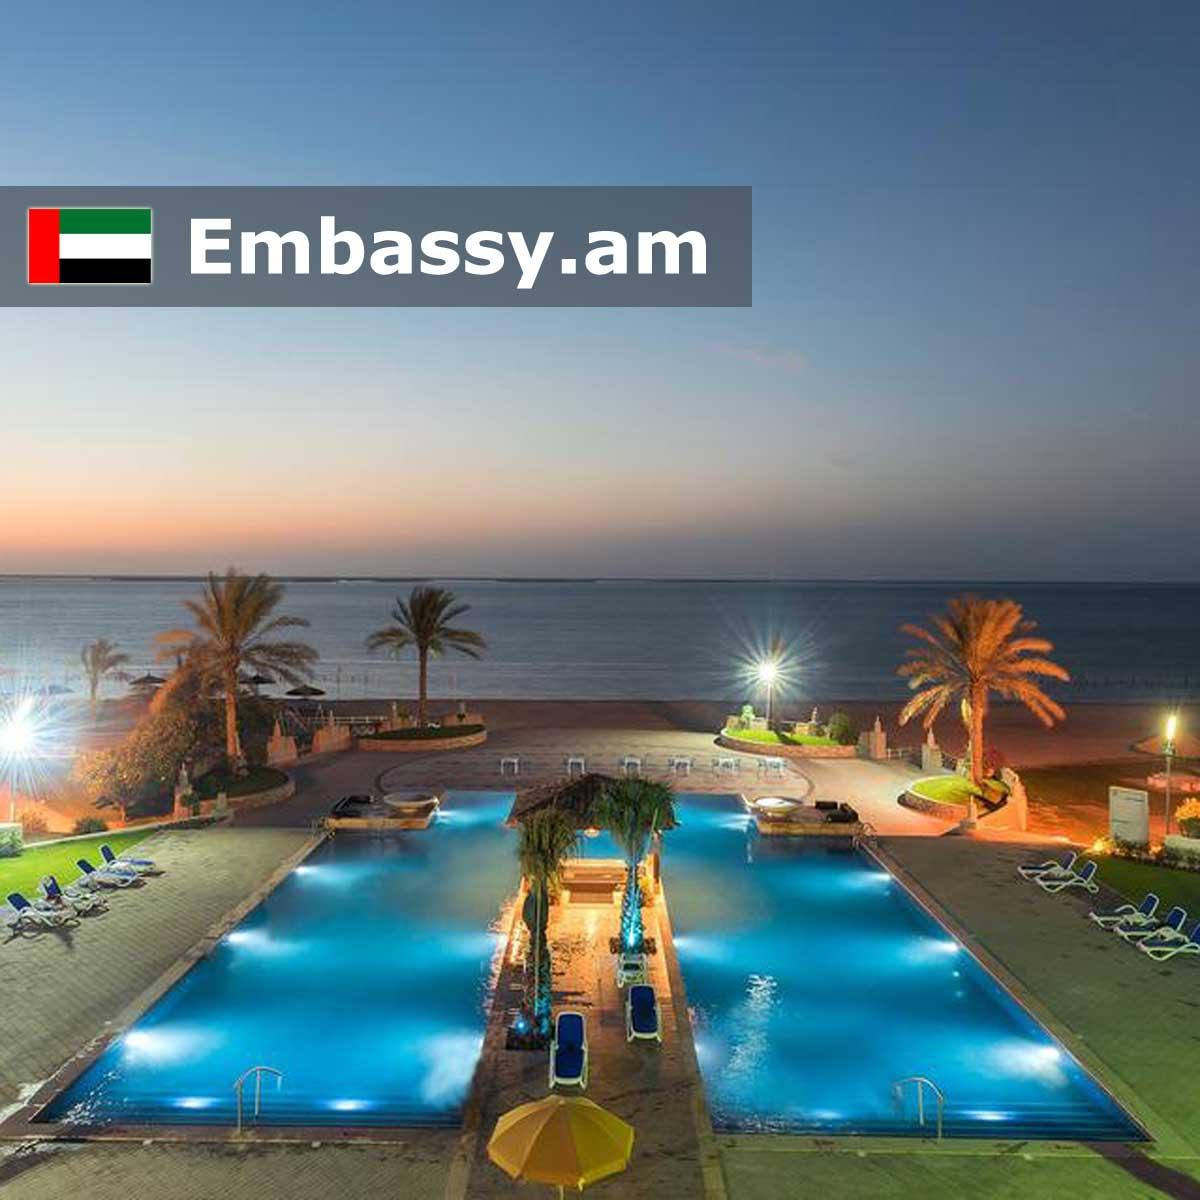 Umm Al Quwain - Hotels in the United Arab Emirates - Embassy.am